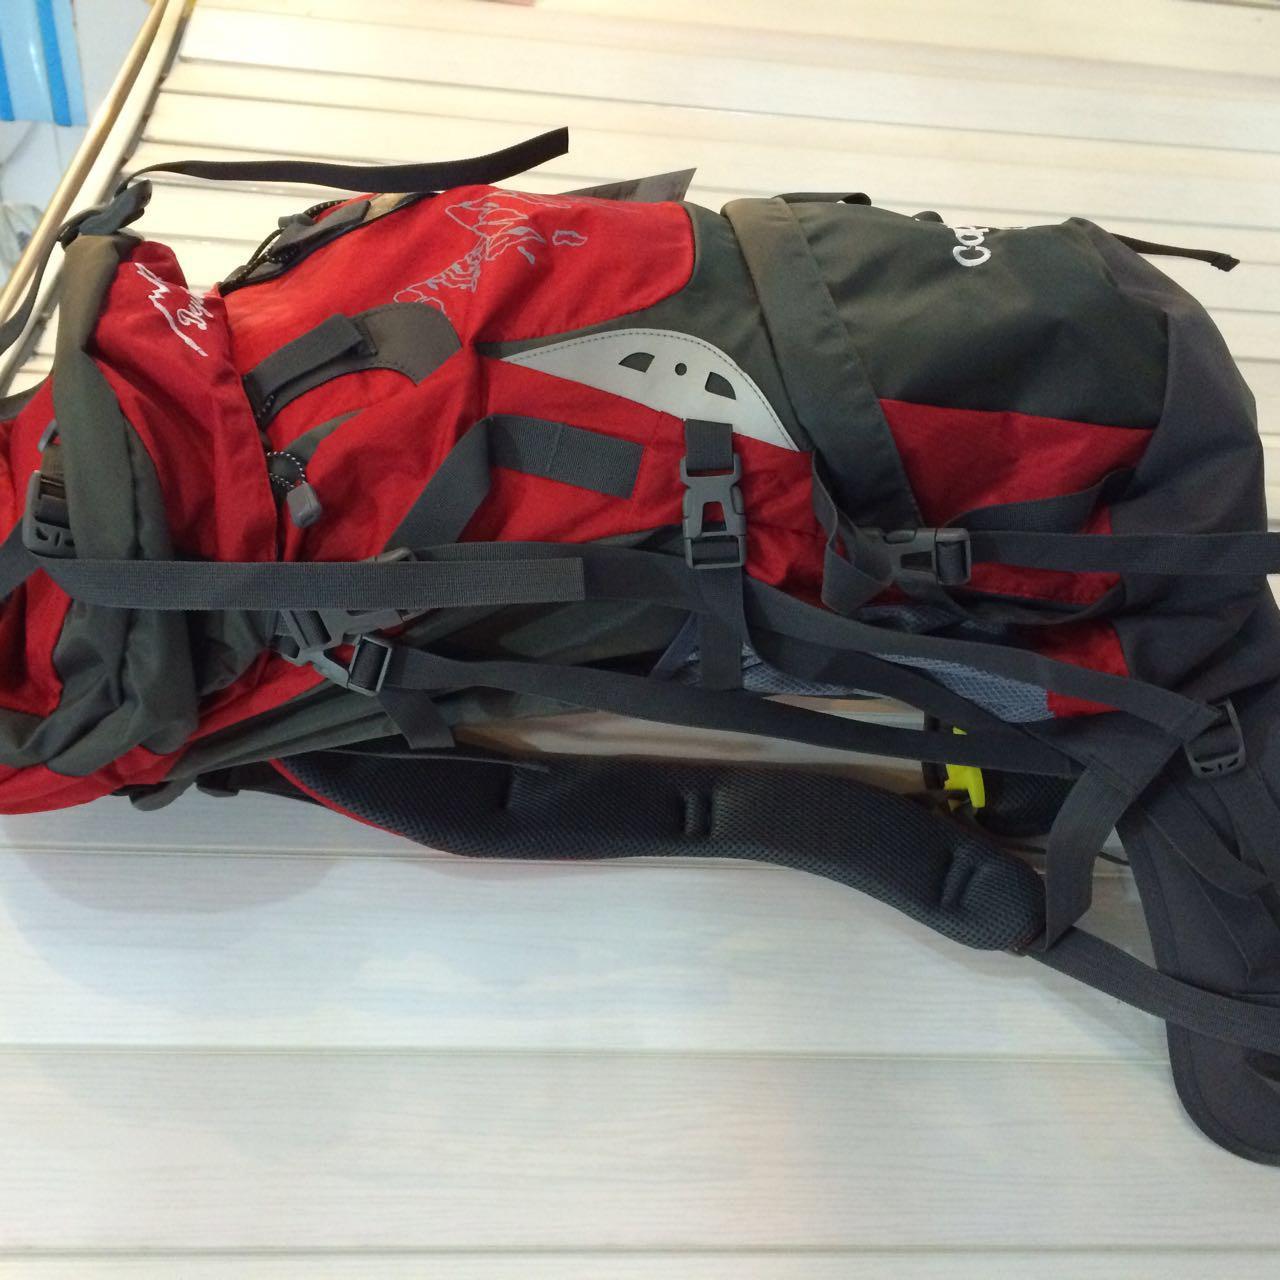 Горный рюкзак Capacity 80L - фото 3